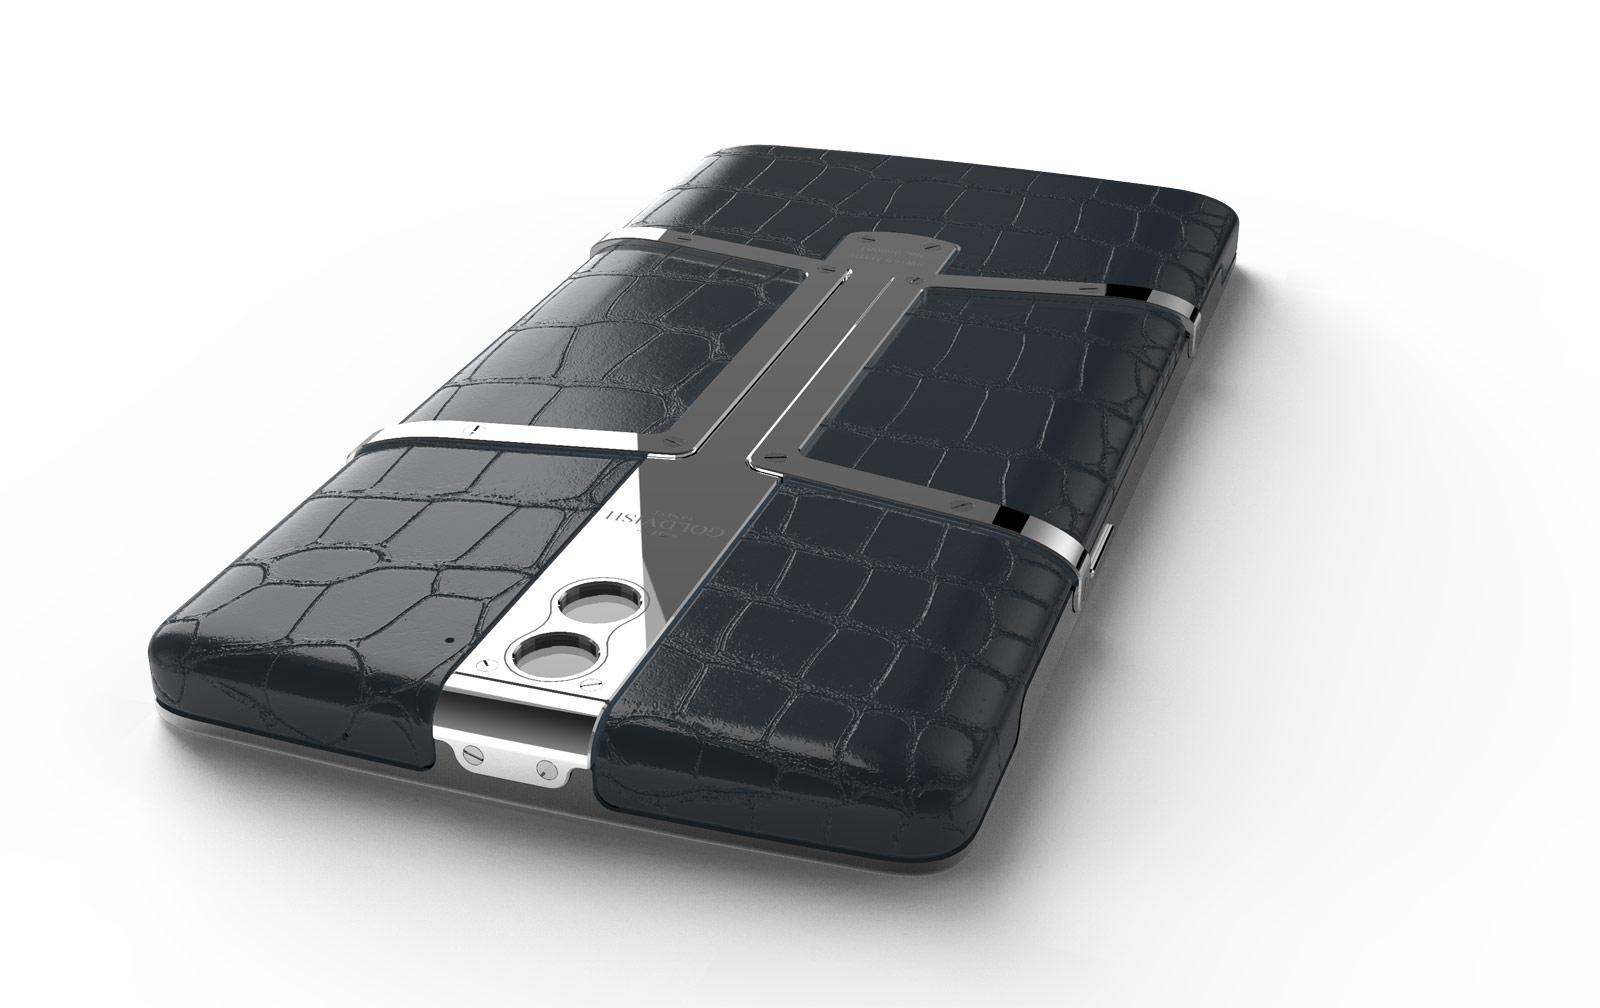 The Goldvish Eclipse Ultra-Premium Luxury Mobile Phone